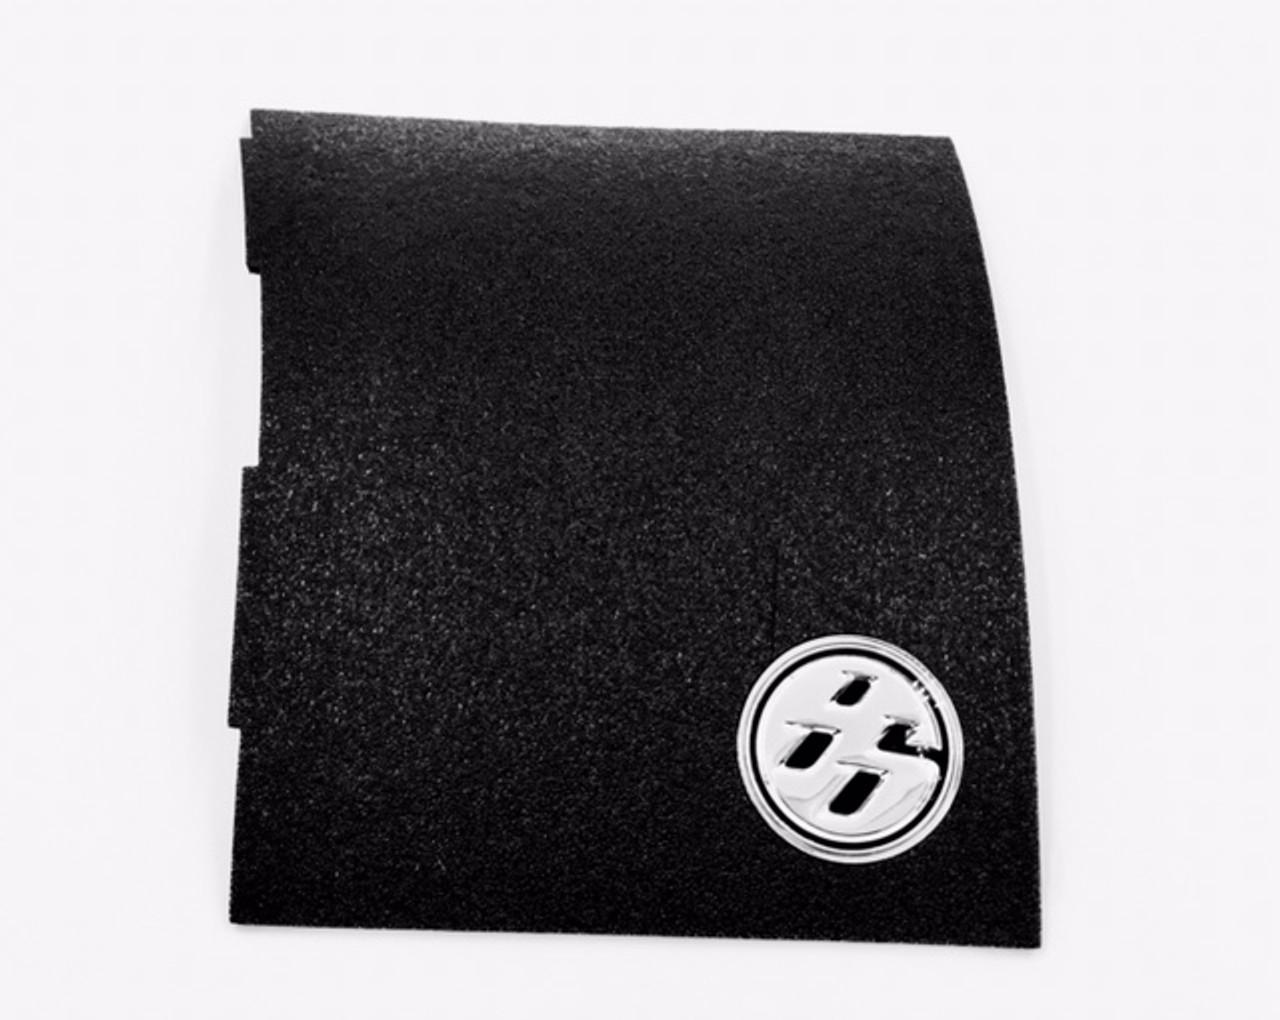 86 Fender Emblem (CHROME/BLACK)